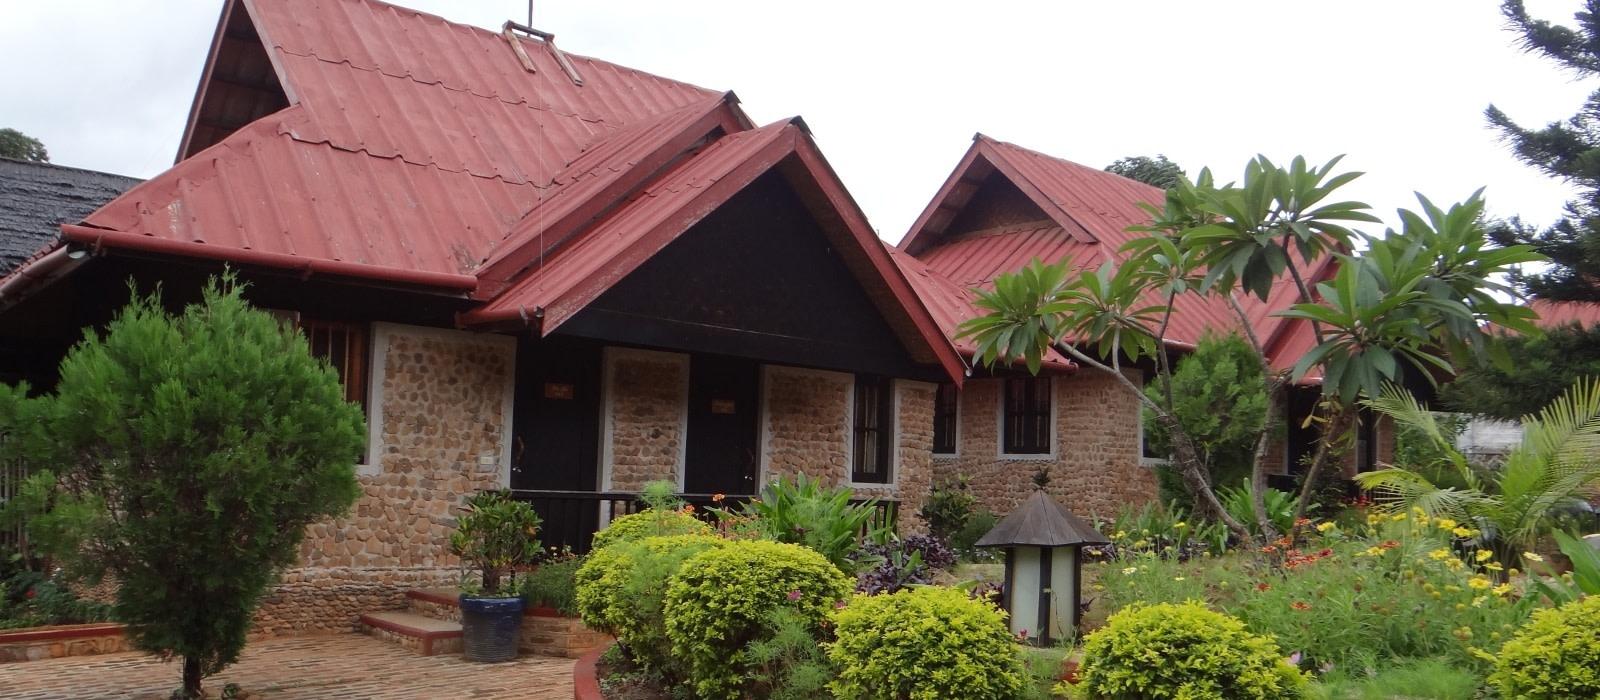 Hotel Inle Inn (Pindaya) Myanmar